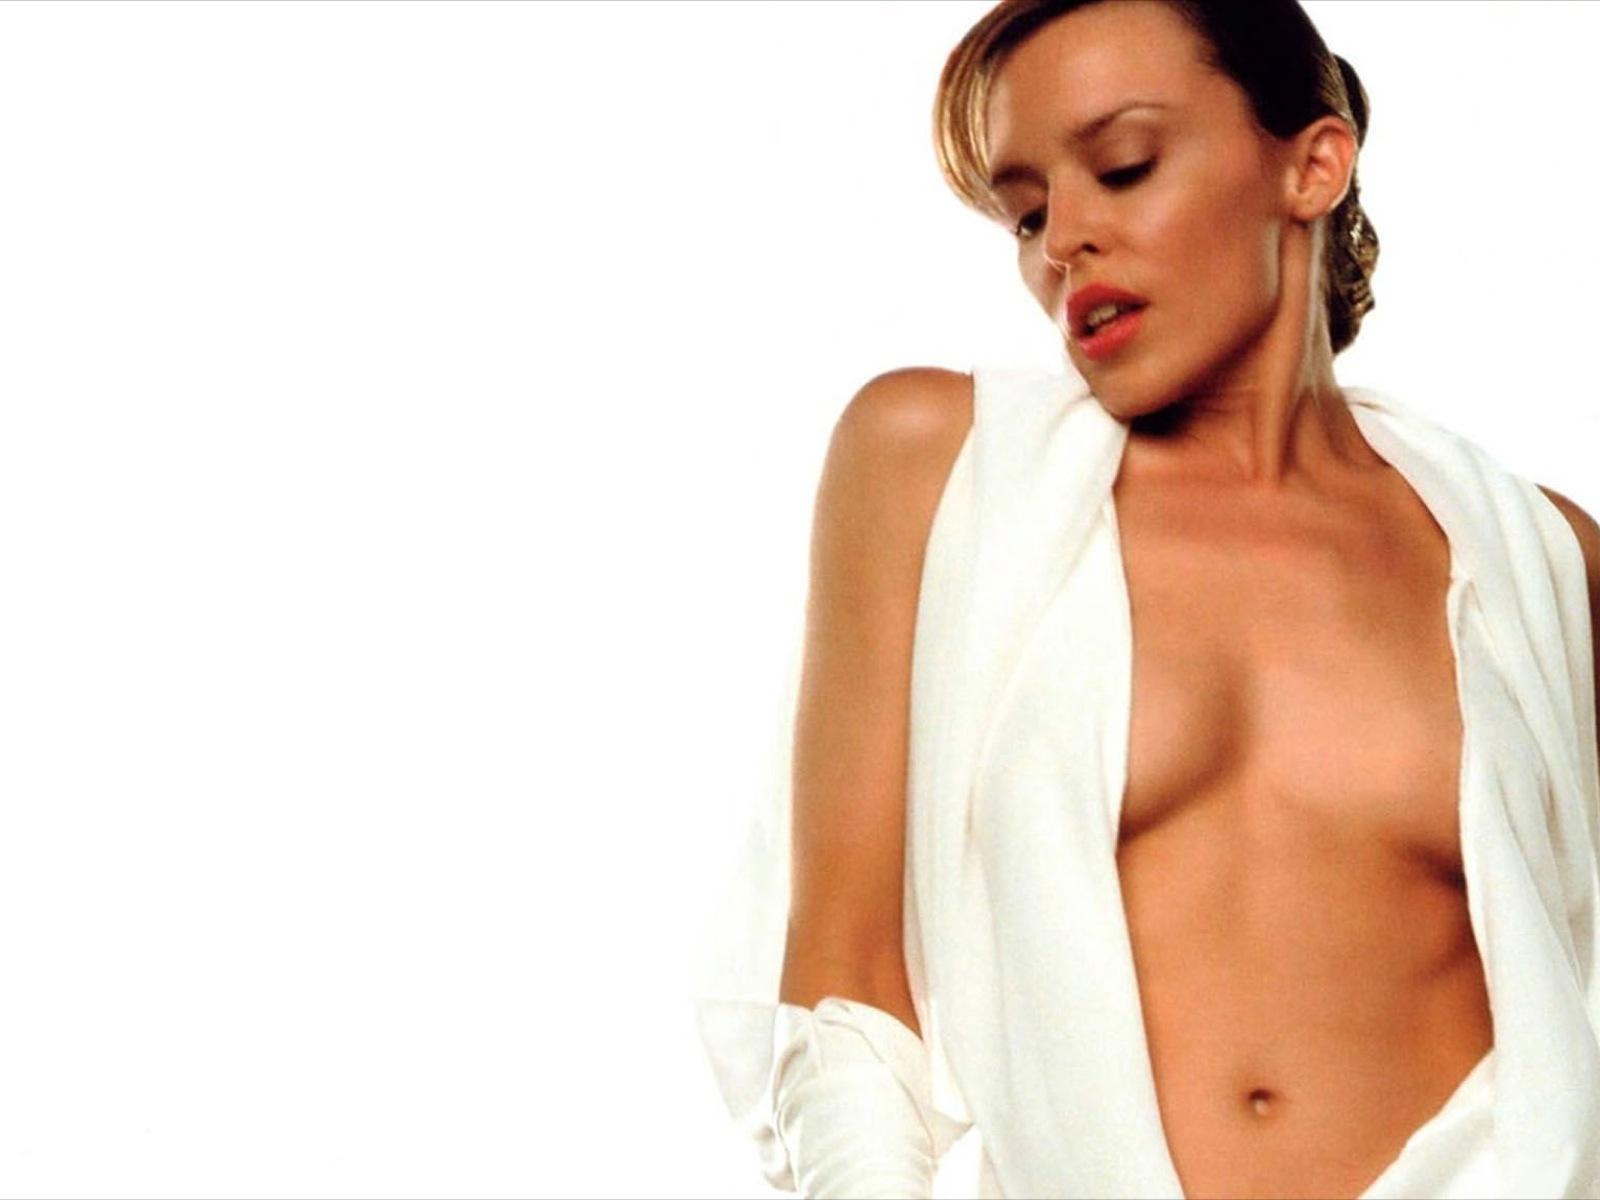 http://2.bp.blogspot.com/-UlIiqVKIAc8/UA3gGddkfzI/AAAAAAAABVw/1bZOEs_DuAg/s1600/Kylie_Minogue2.jpg